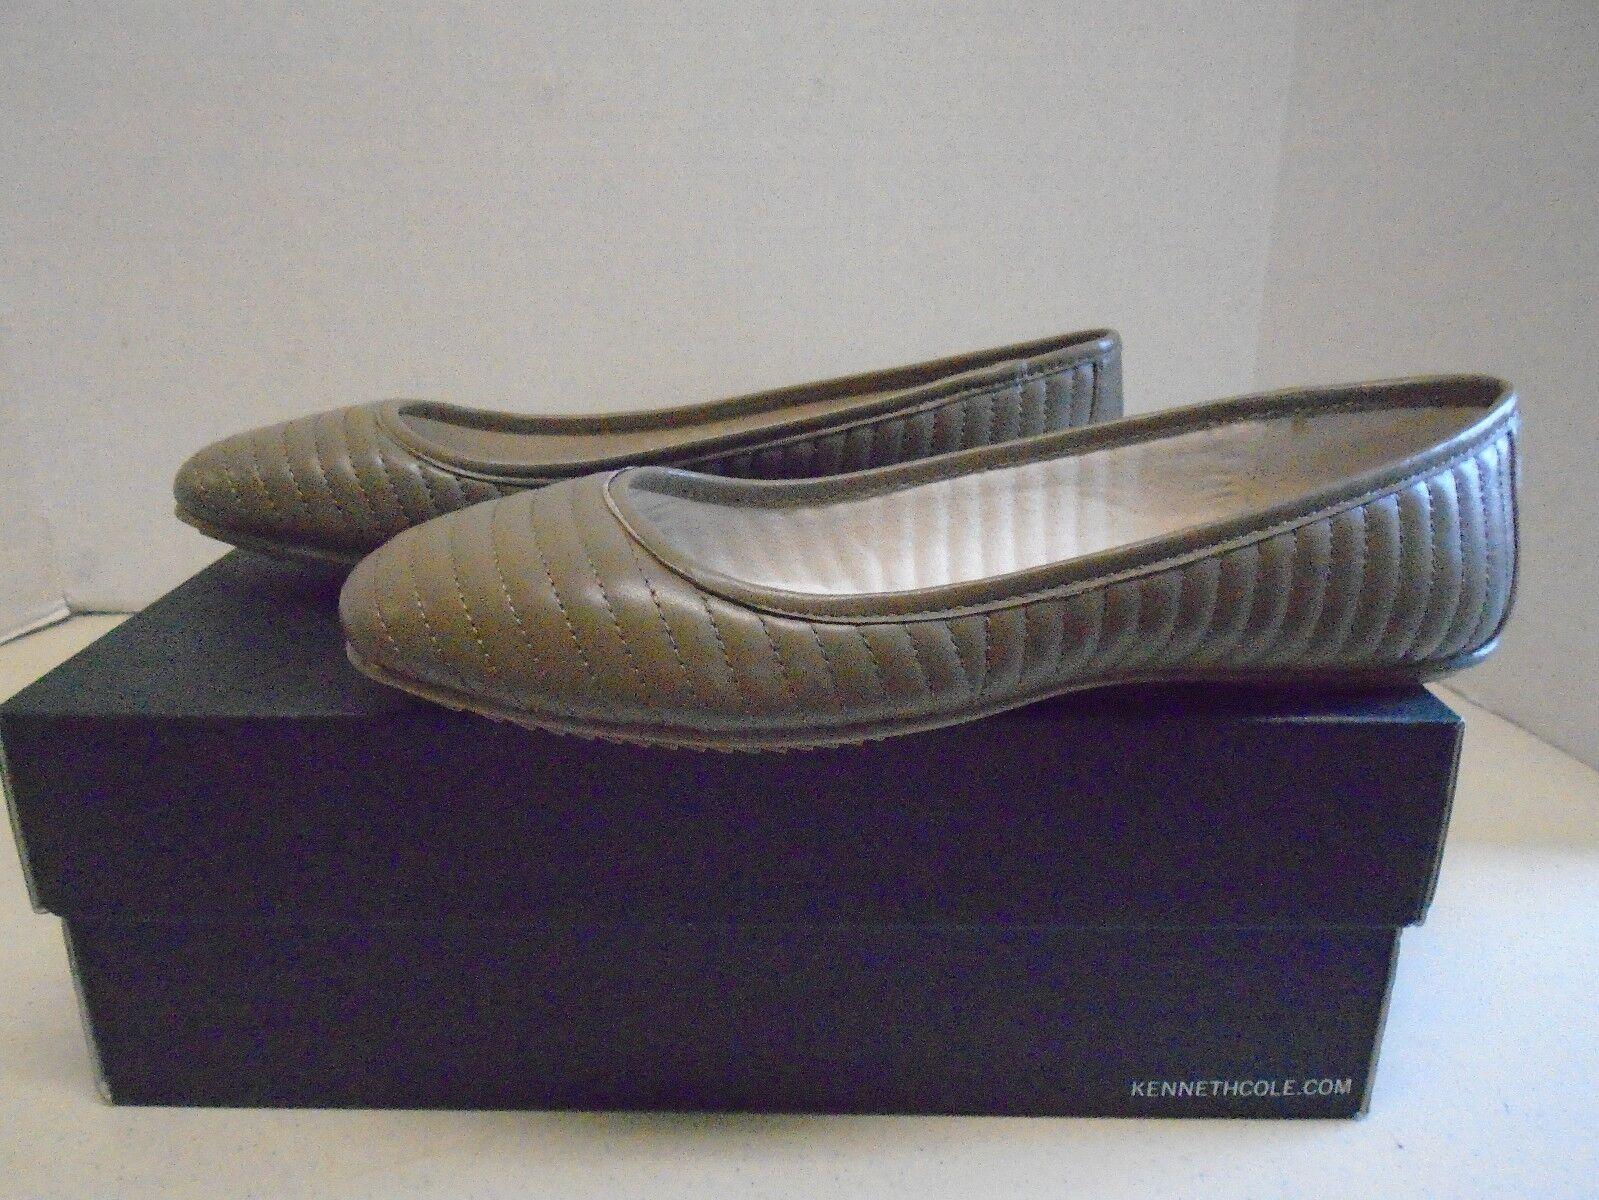 Kenneth Cole New York Tracy Black Womens Tan Shoes Beige Tan Womens Flats New 7 1/2 M cf14f9